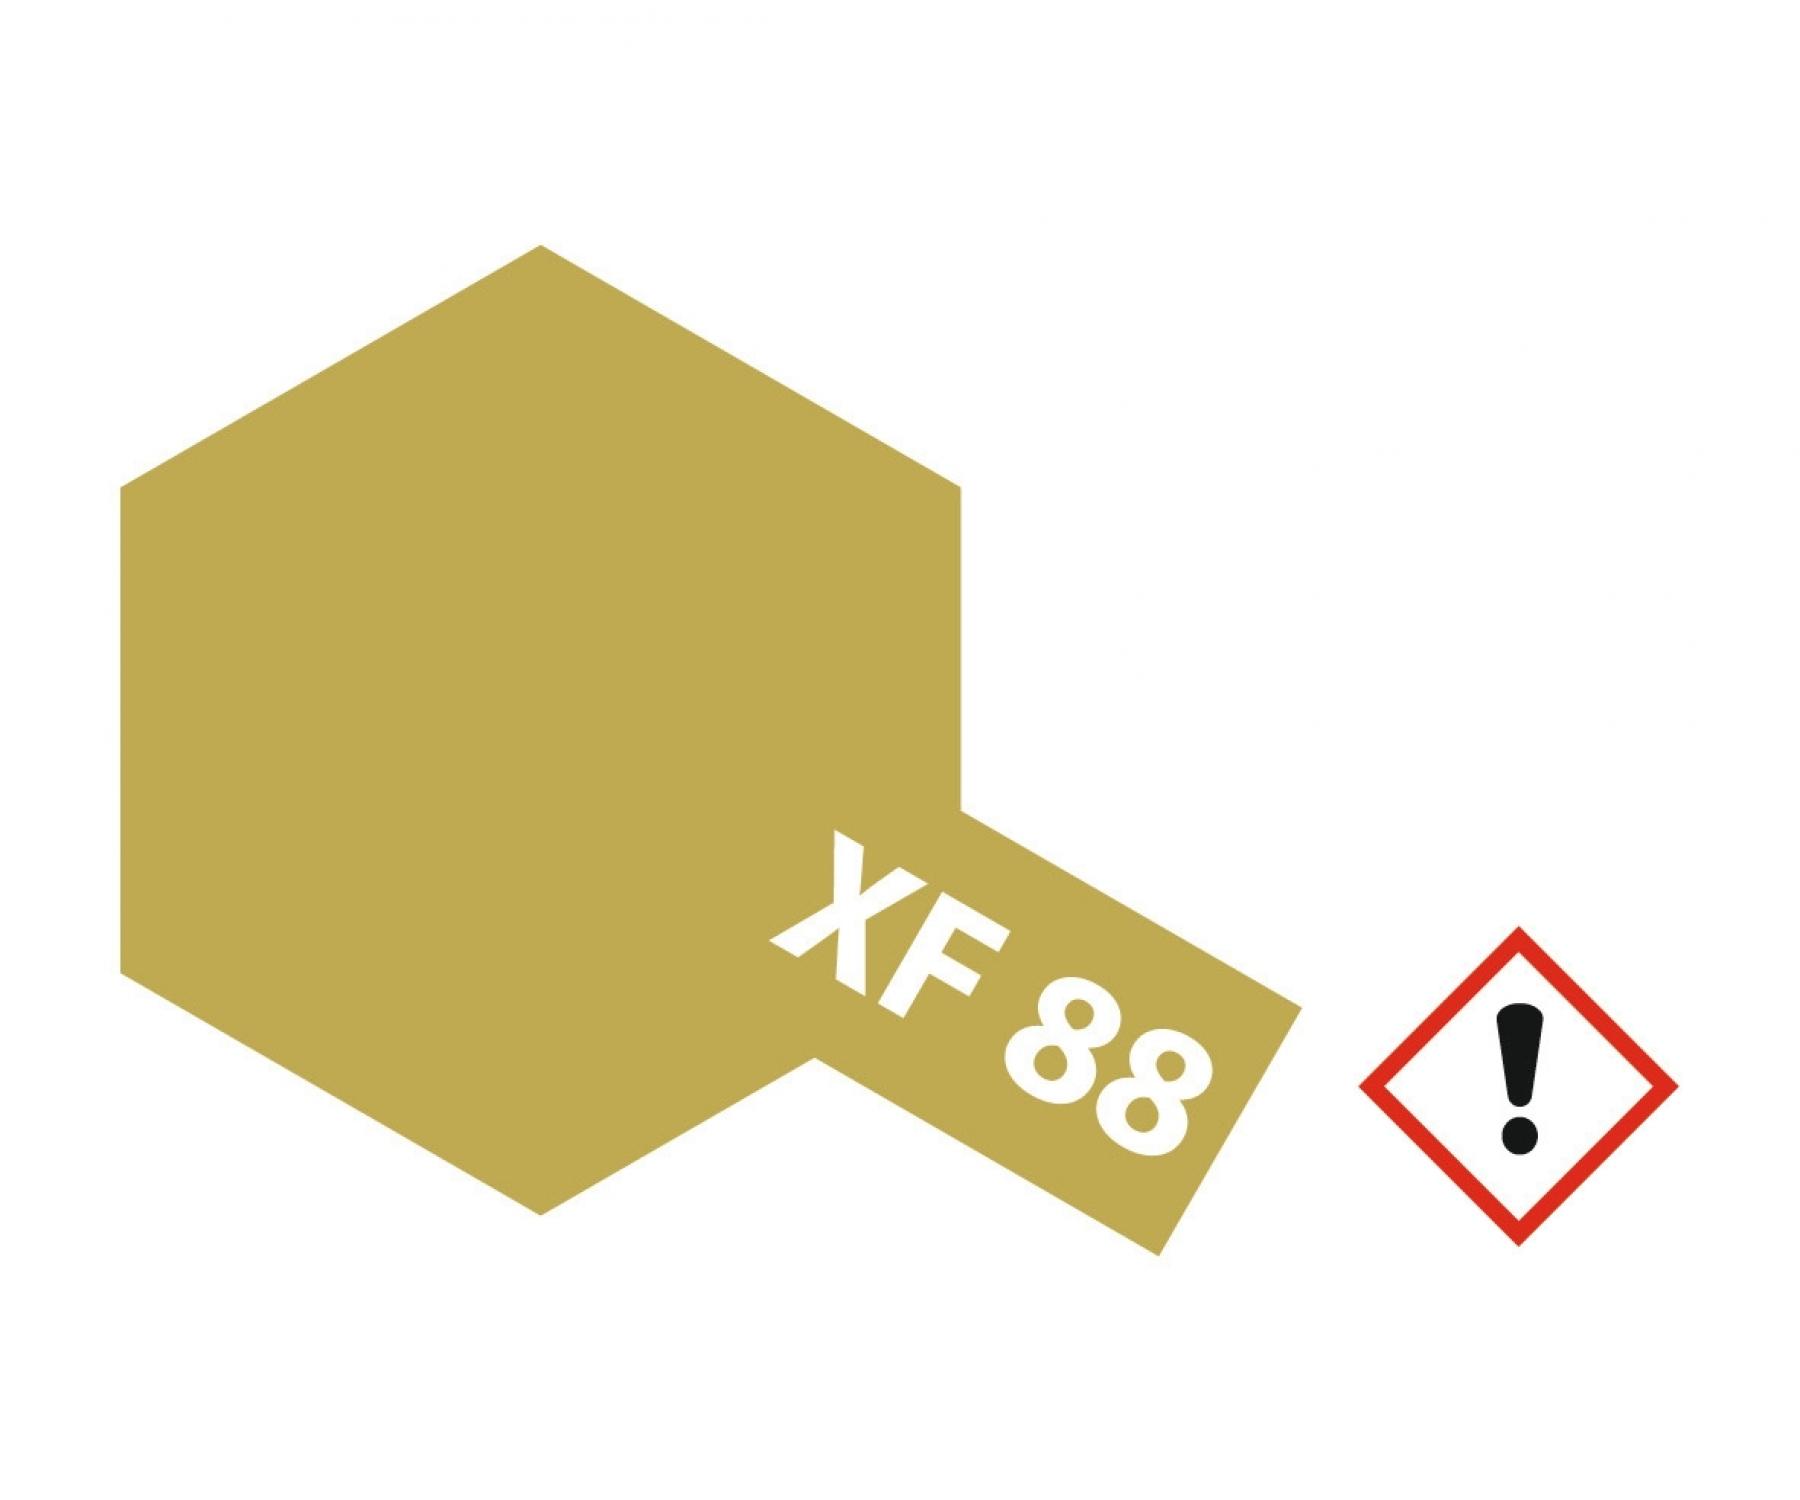 XF-88 Dunkelgelb 2 matt 10ml Acryl - Acrylstreichfarbe wasserloeslich Tamiya 300081788